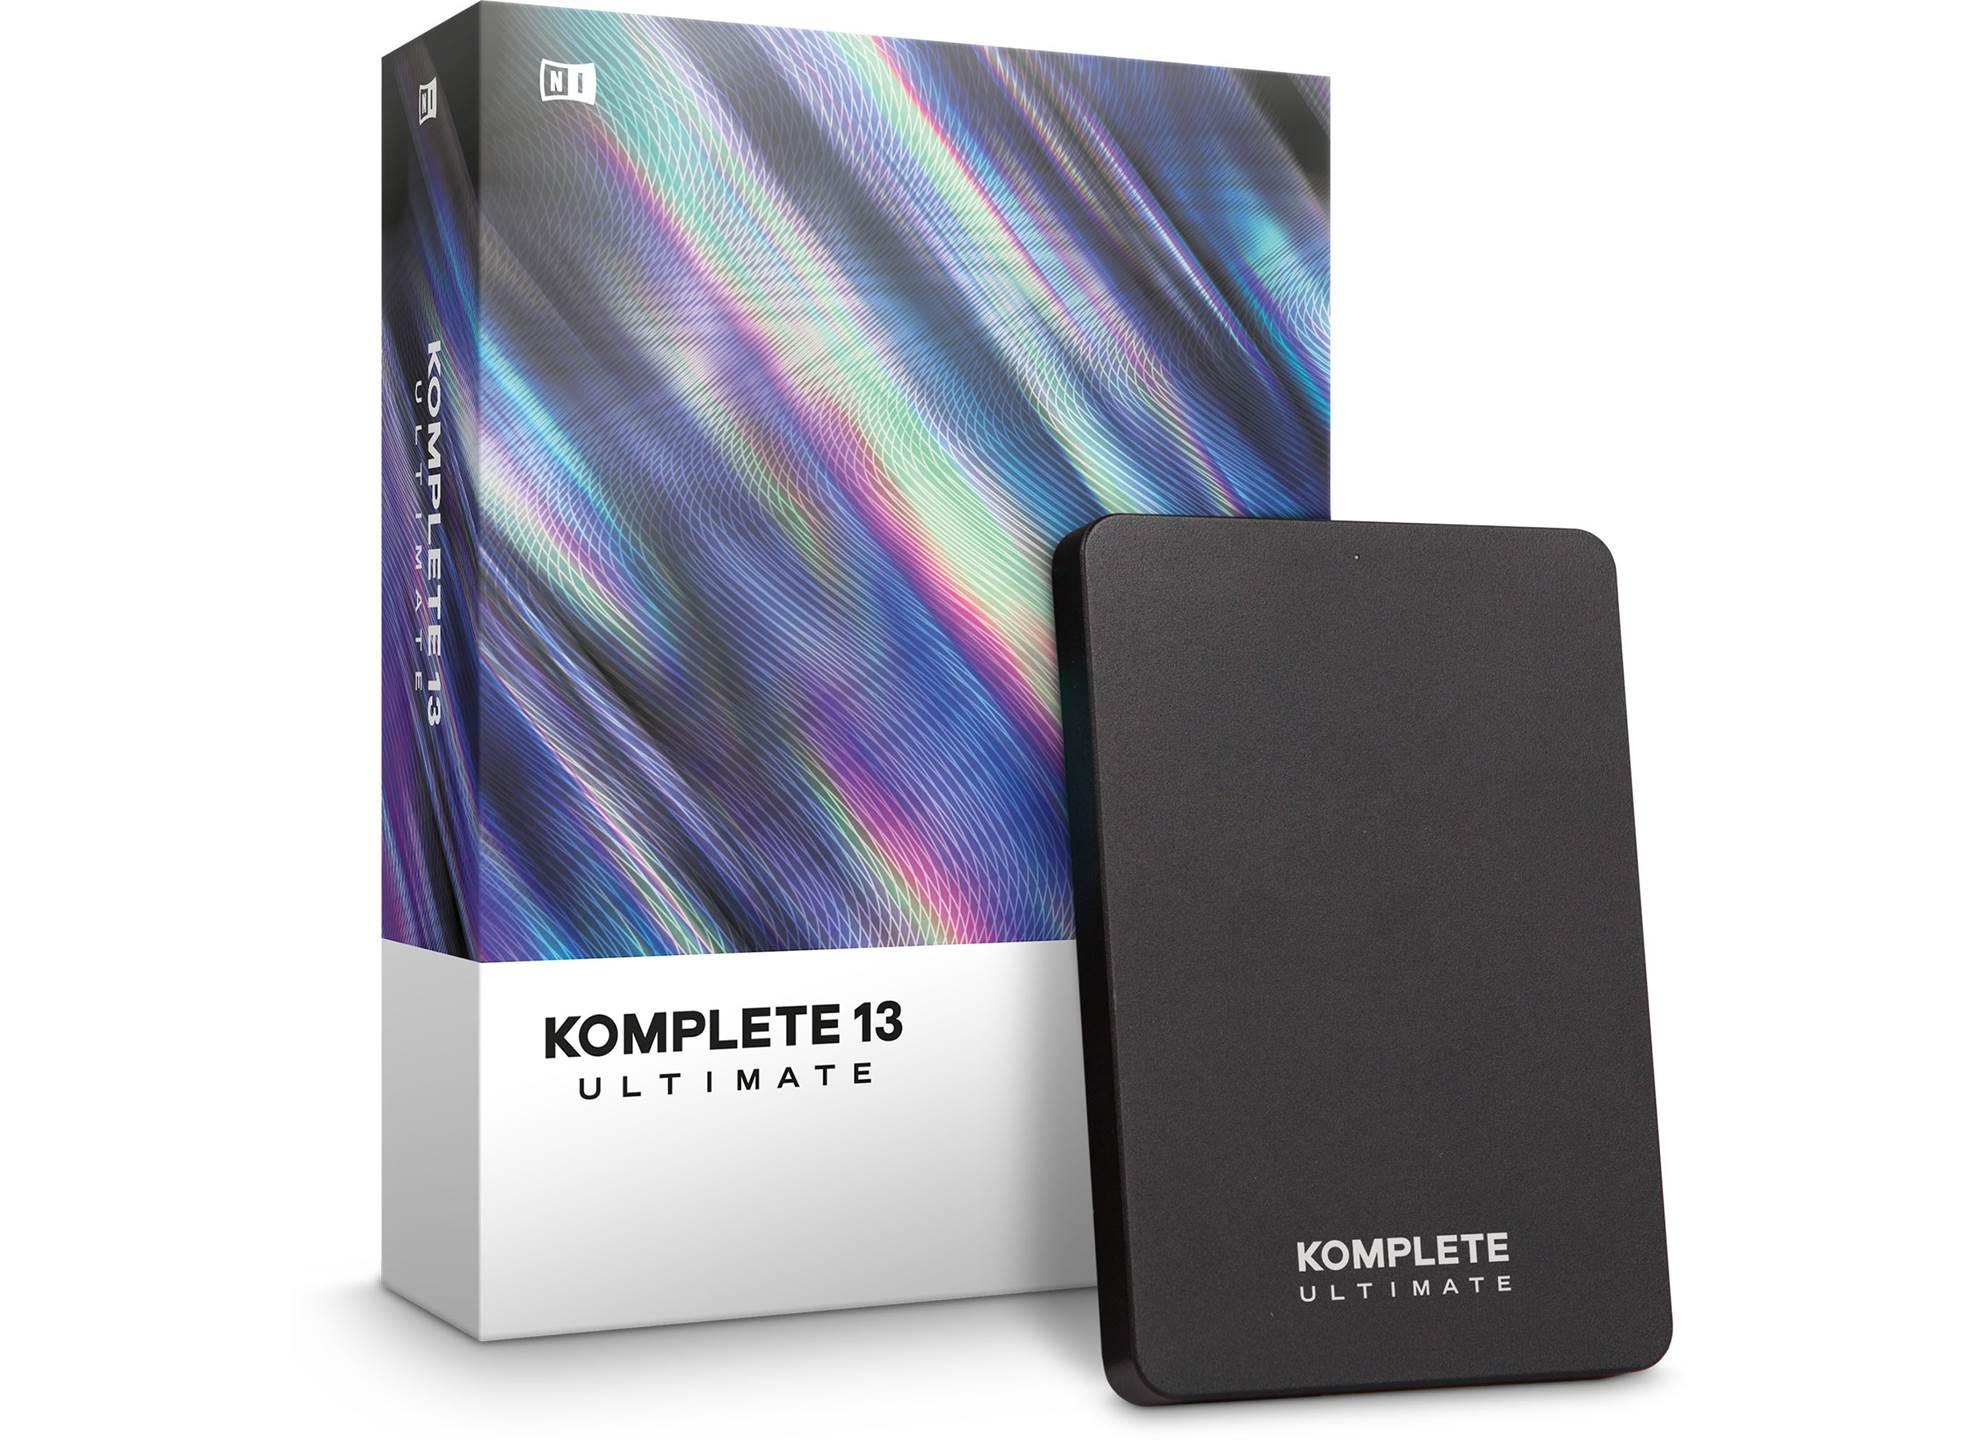 Komplete 13 Ultimate Upgrade K8-13